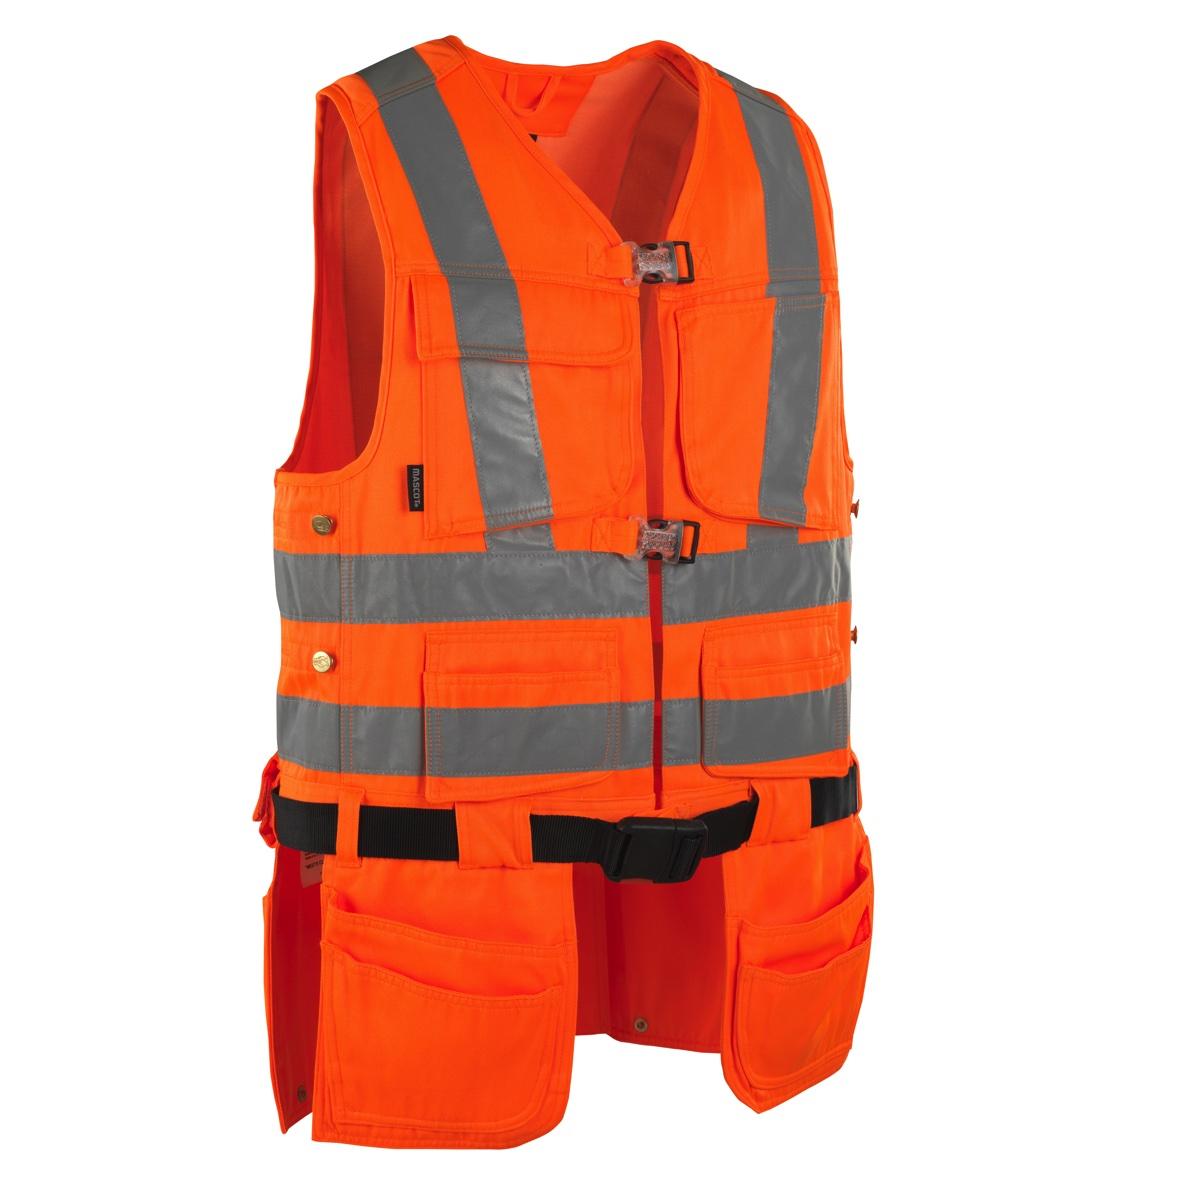 FE Engel Warnschutz Regenhose 5 Farben EN ISO 20471